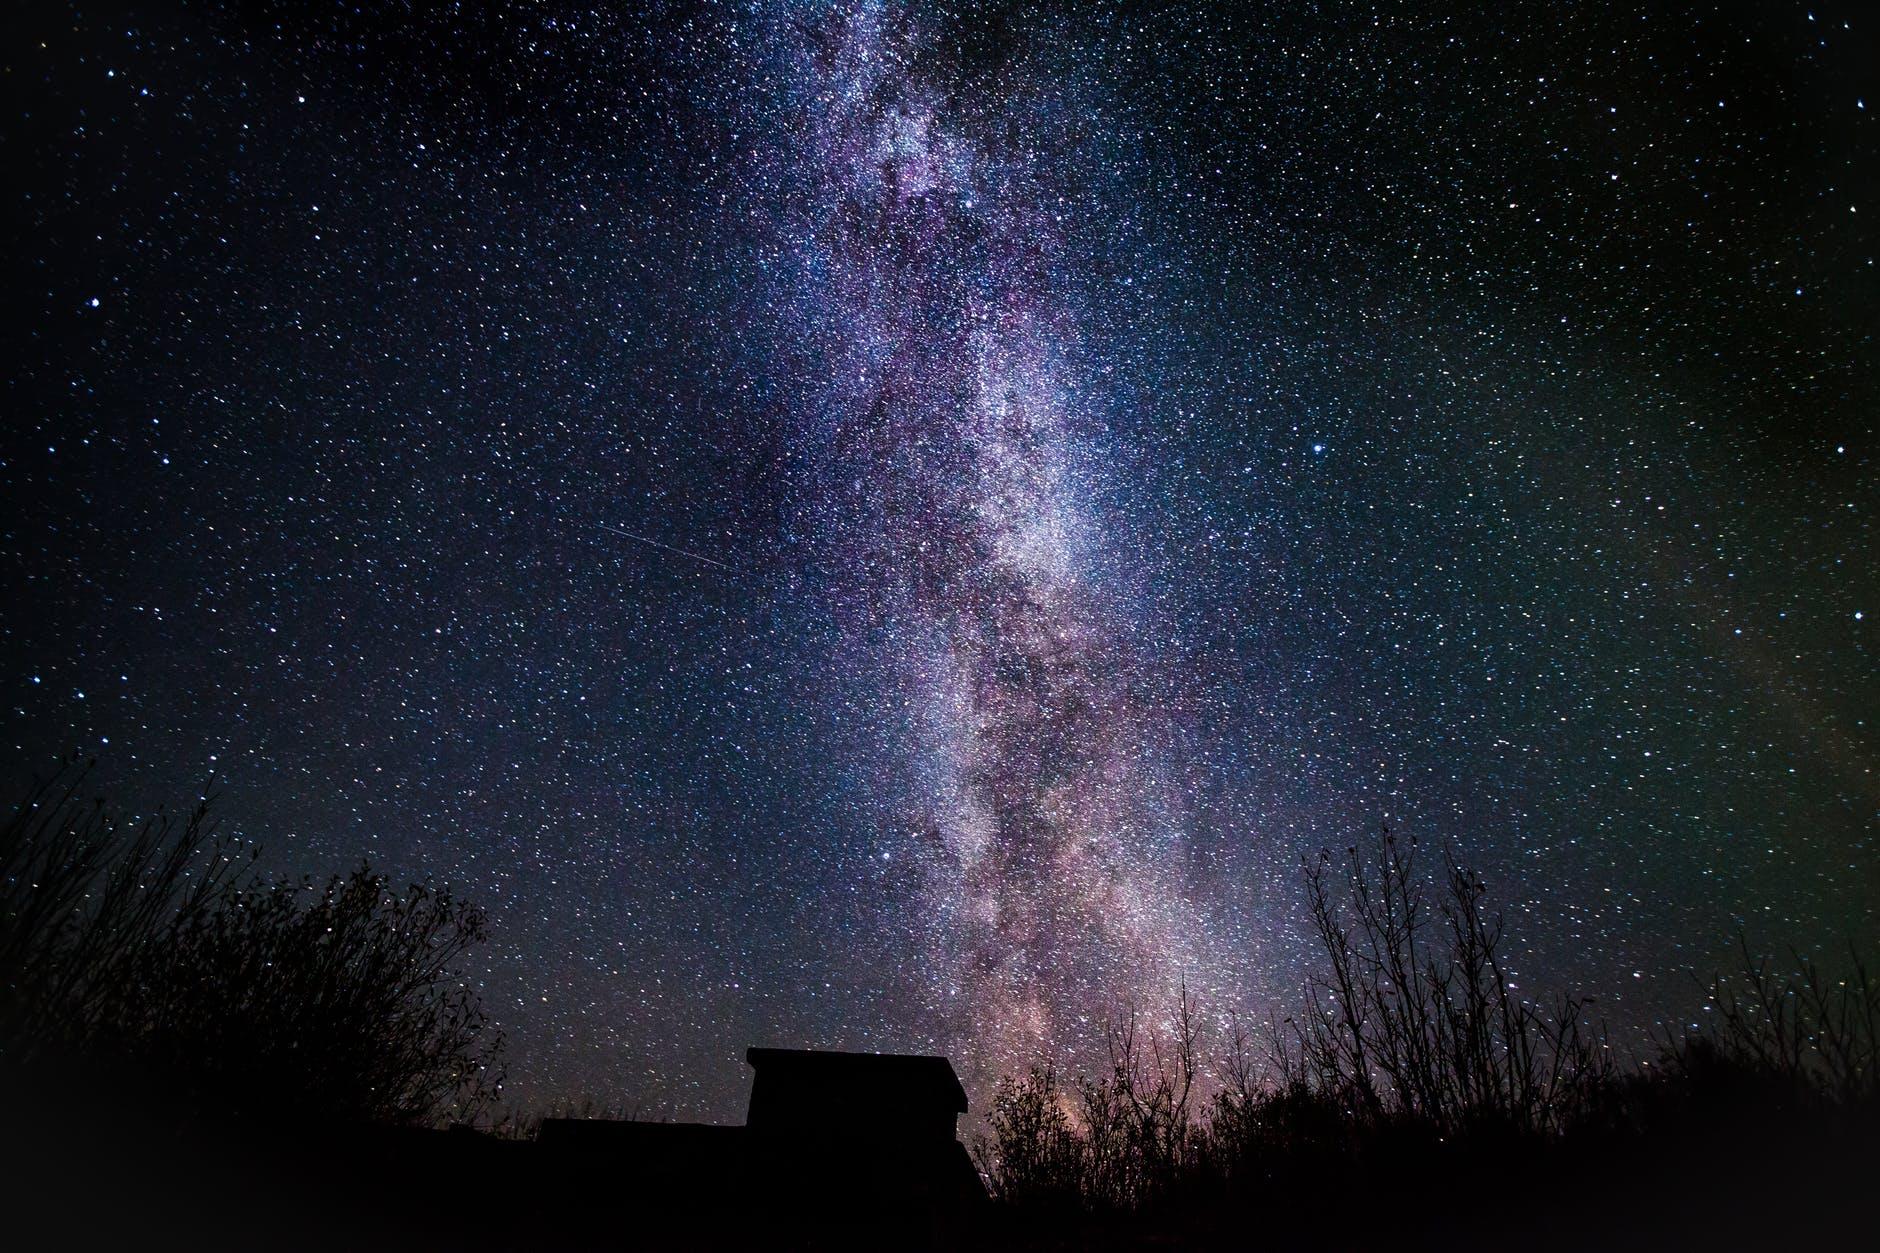 stars at night